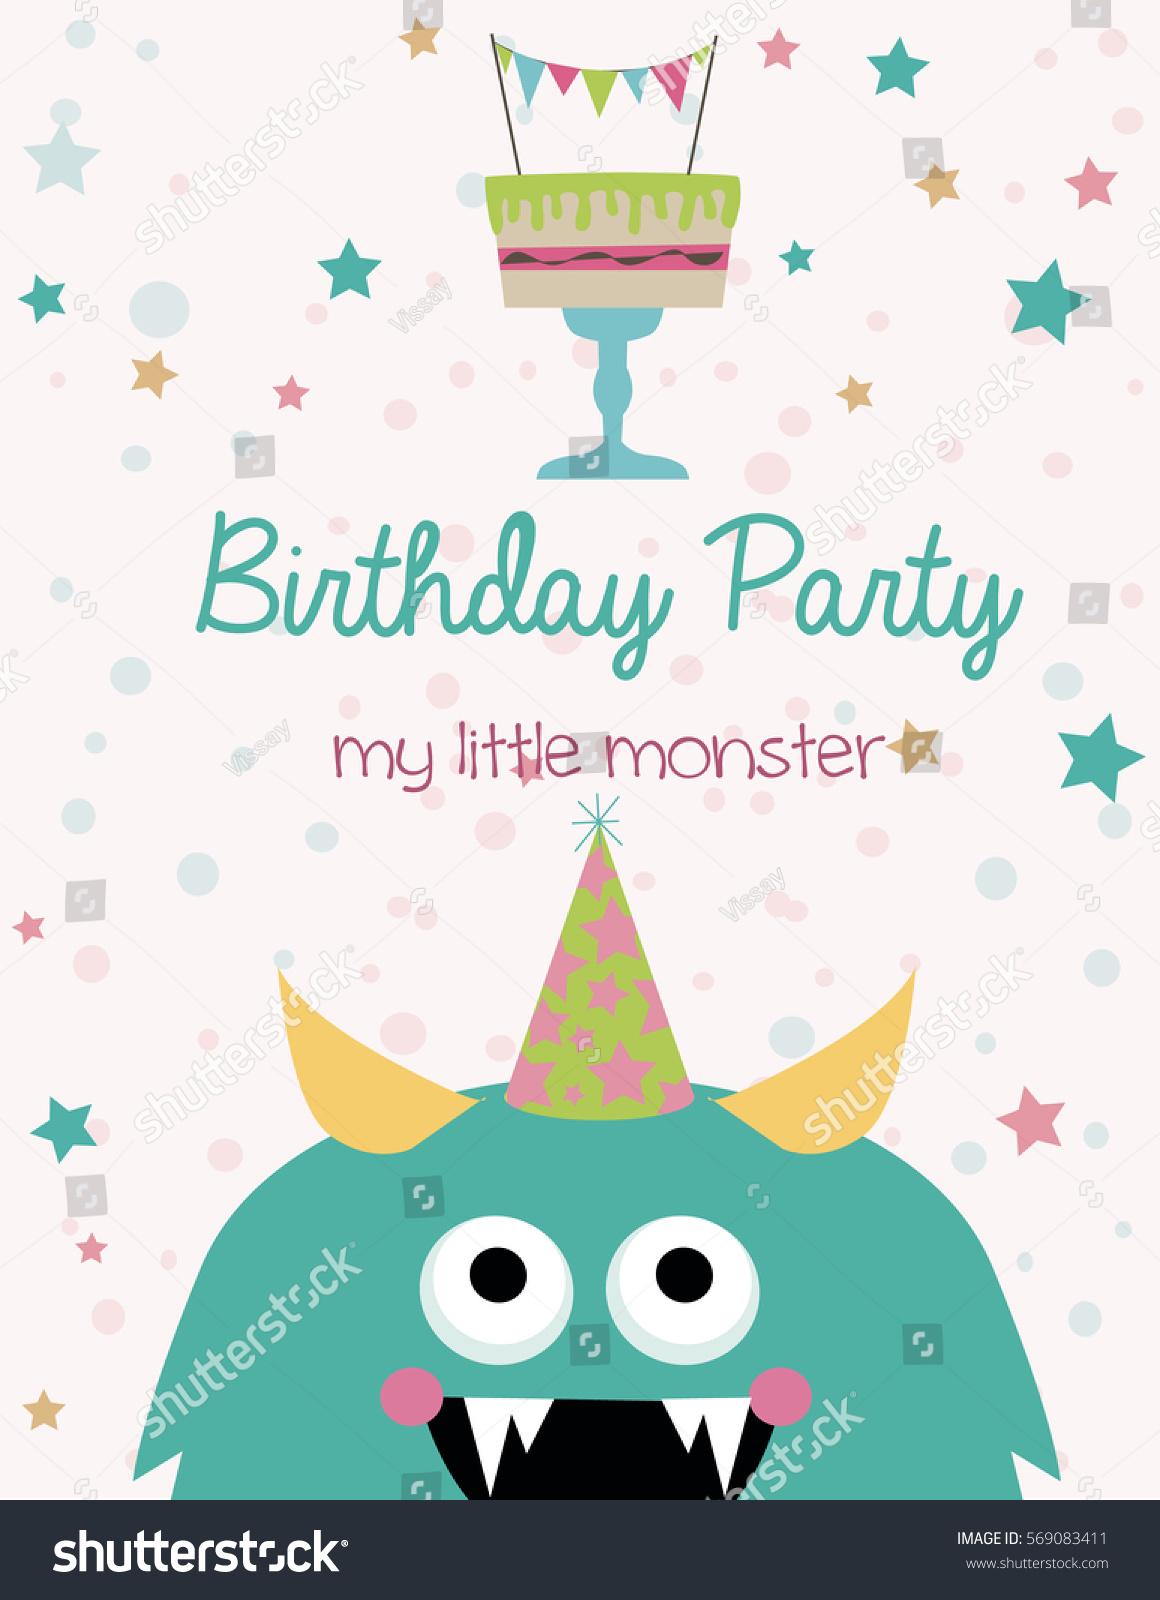 Funny Birthday Greeting Invitation Card Monster Stock Vector ...